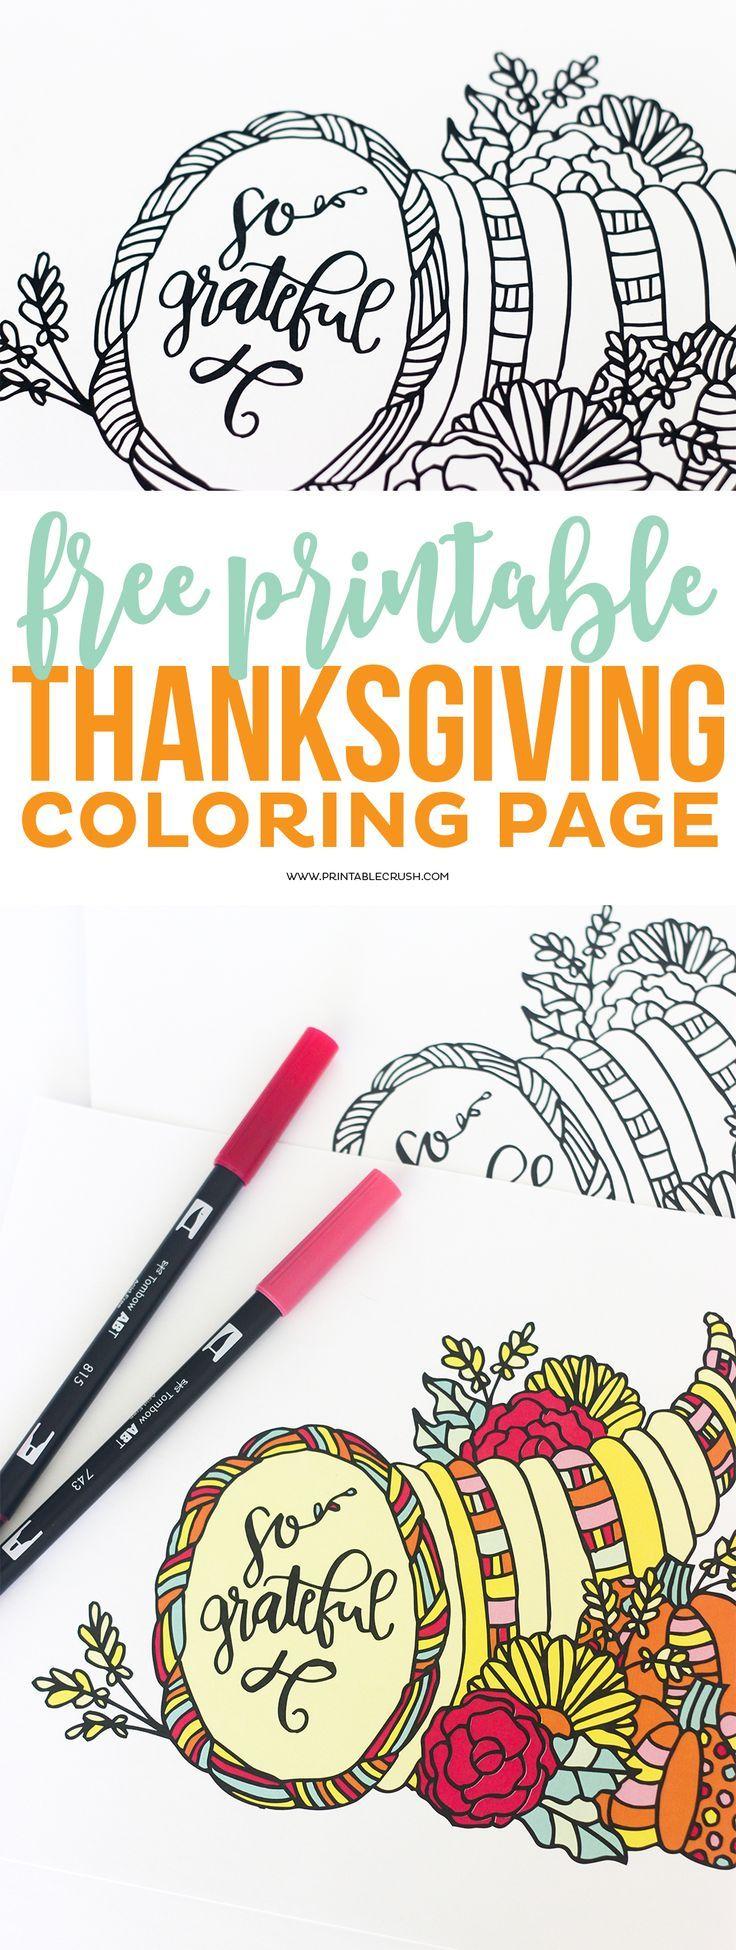 FREE Printable Thanksgiving Coloring Page | Ausmalbilder erwachsene ...